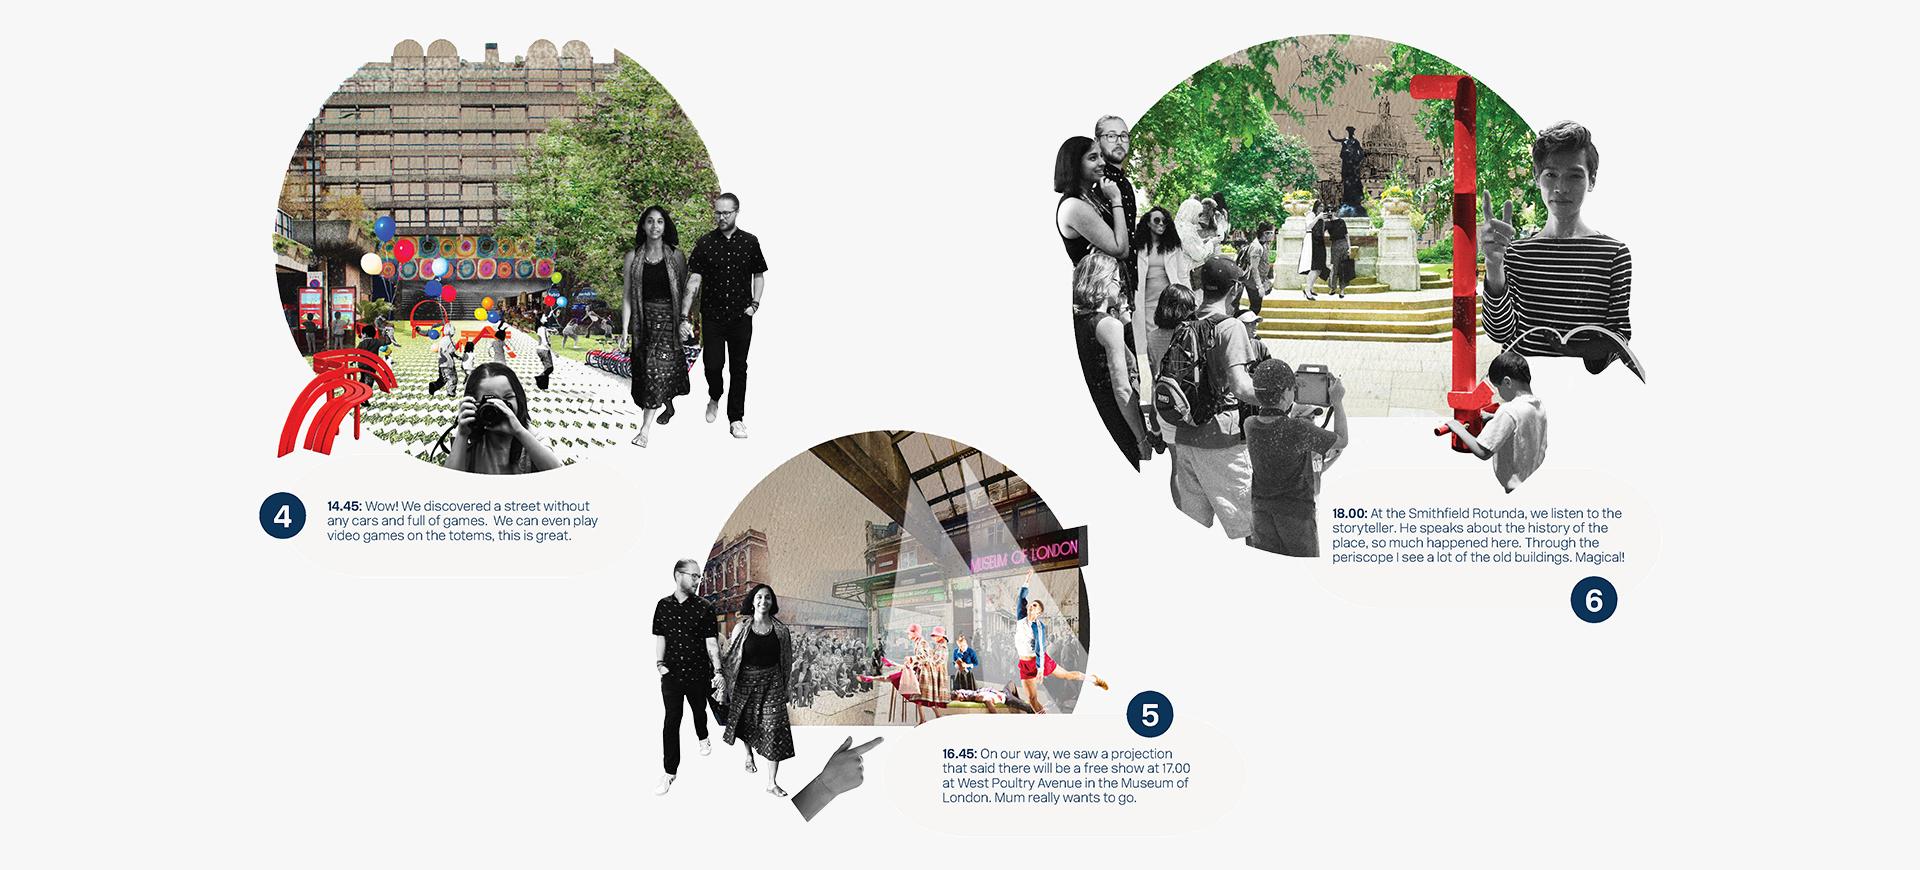 culture-mile-project-image-7